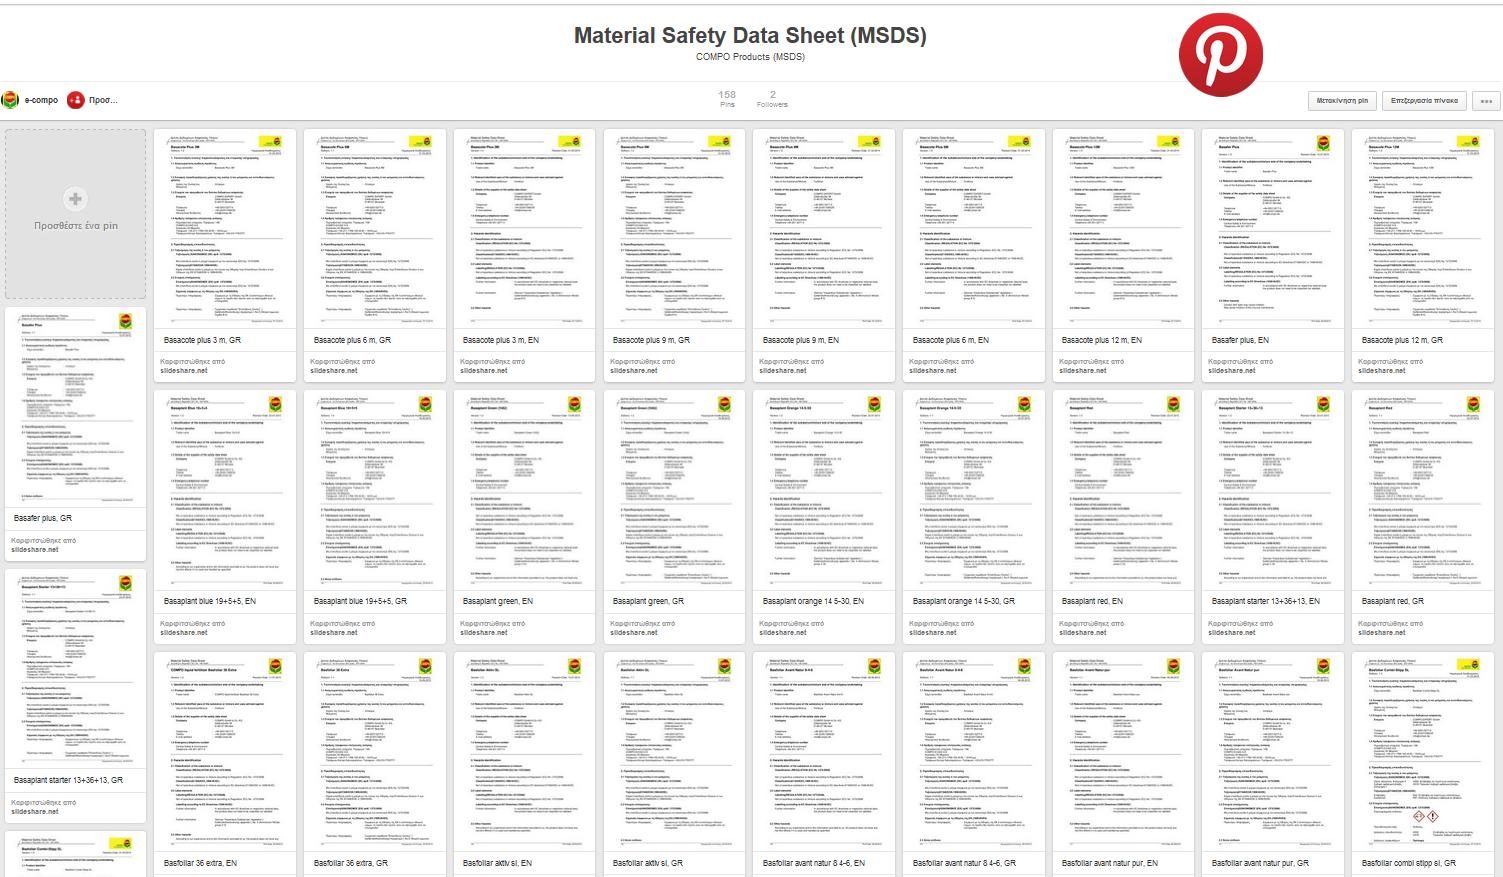 https://www.pinterest.com/eCompogr/material-safety-data-sheet-msds/